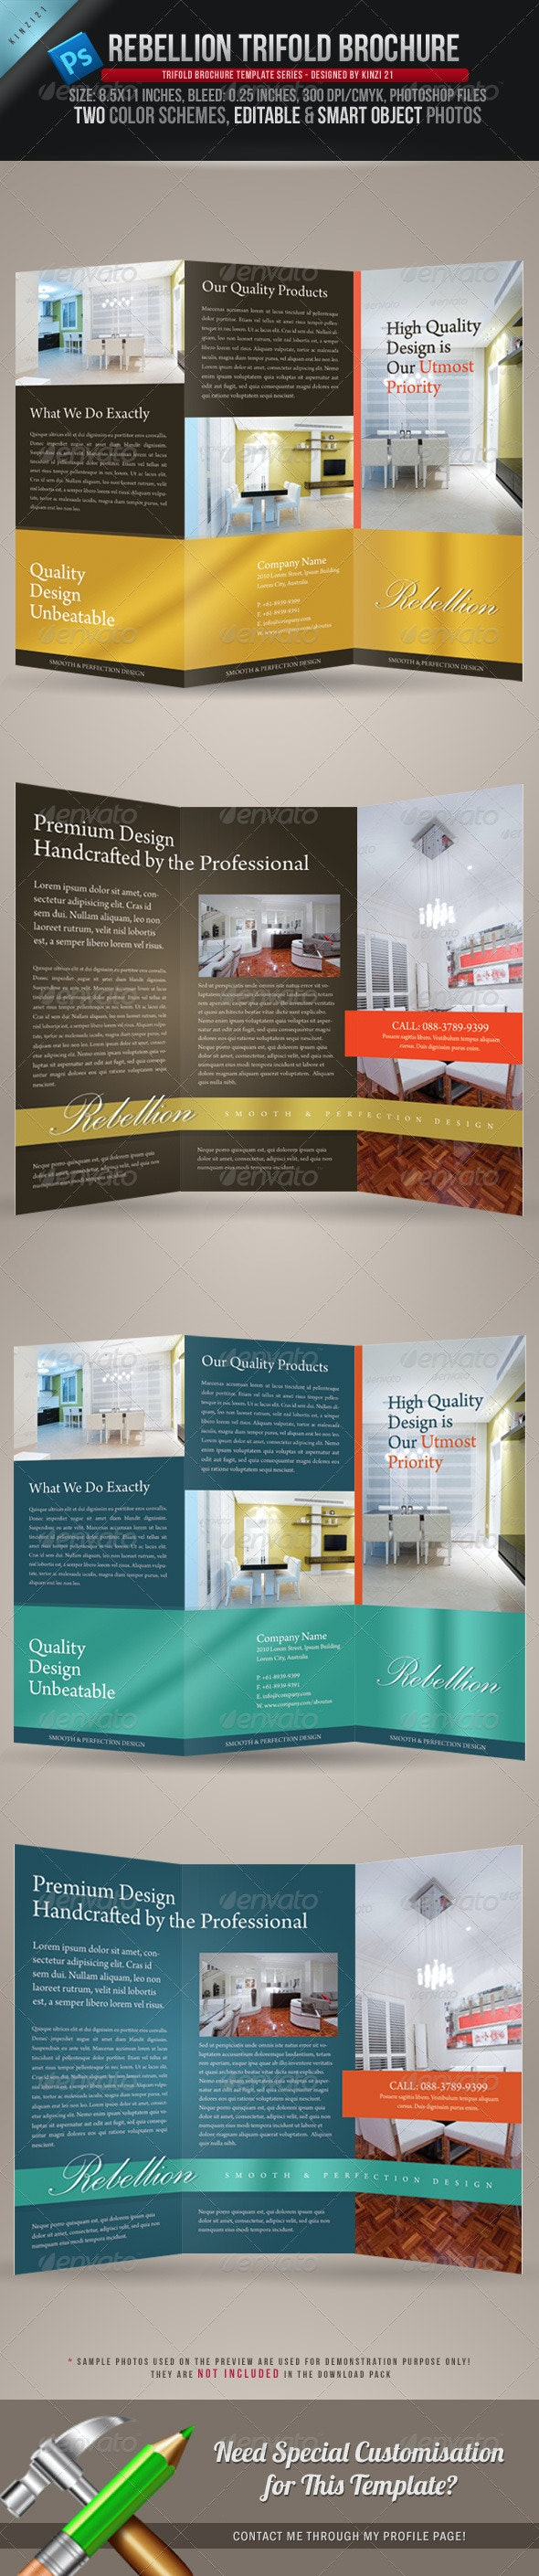 Rebellion Trifold Brochure - PSD Template - Corporate Brochures